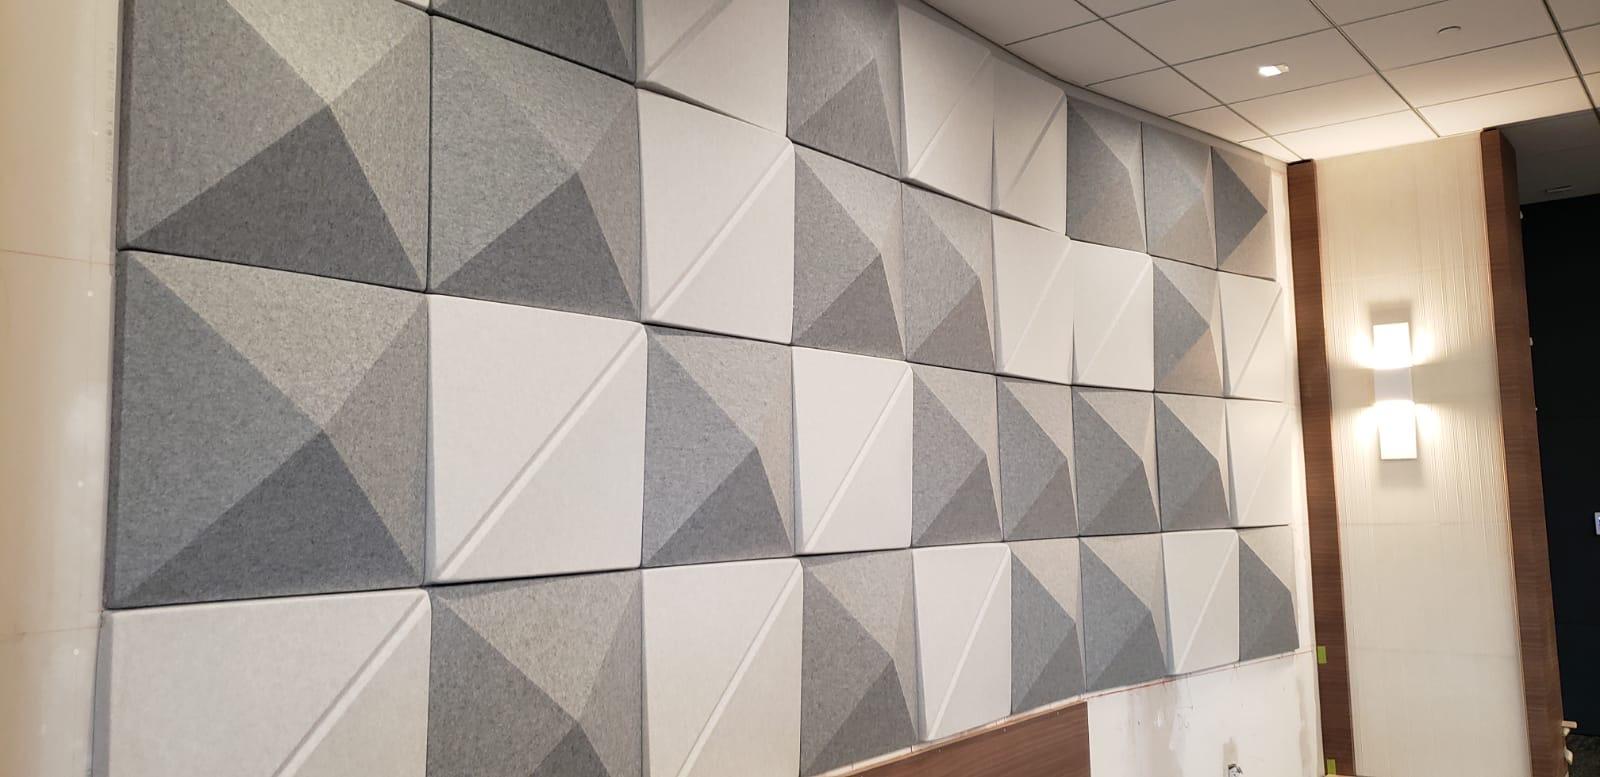 Acoustical Walls